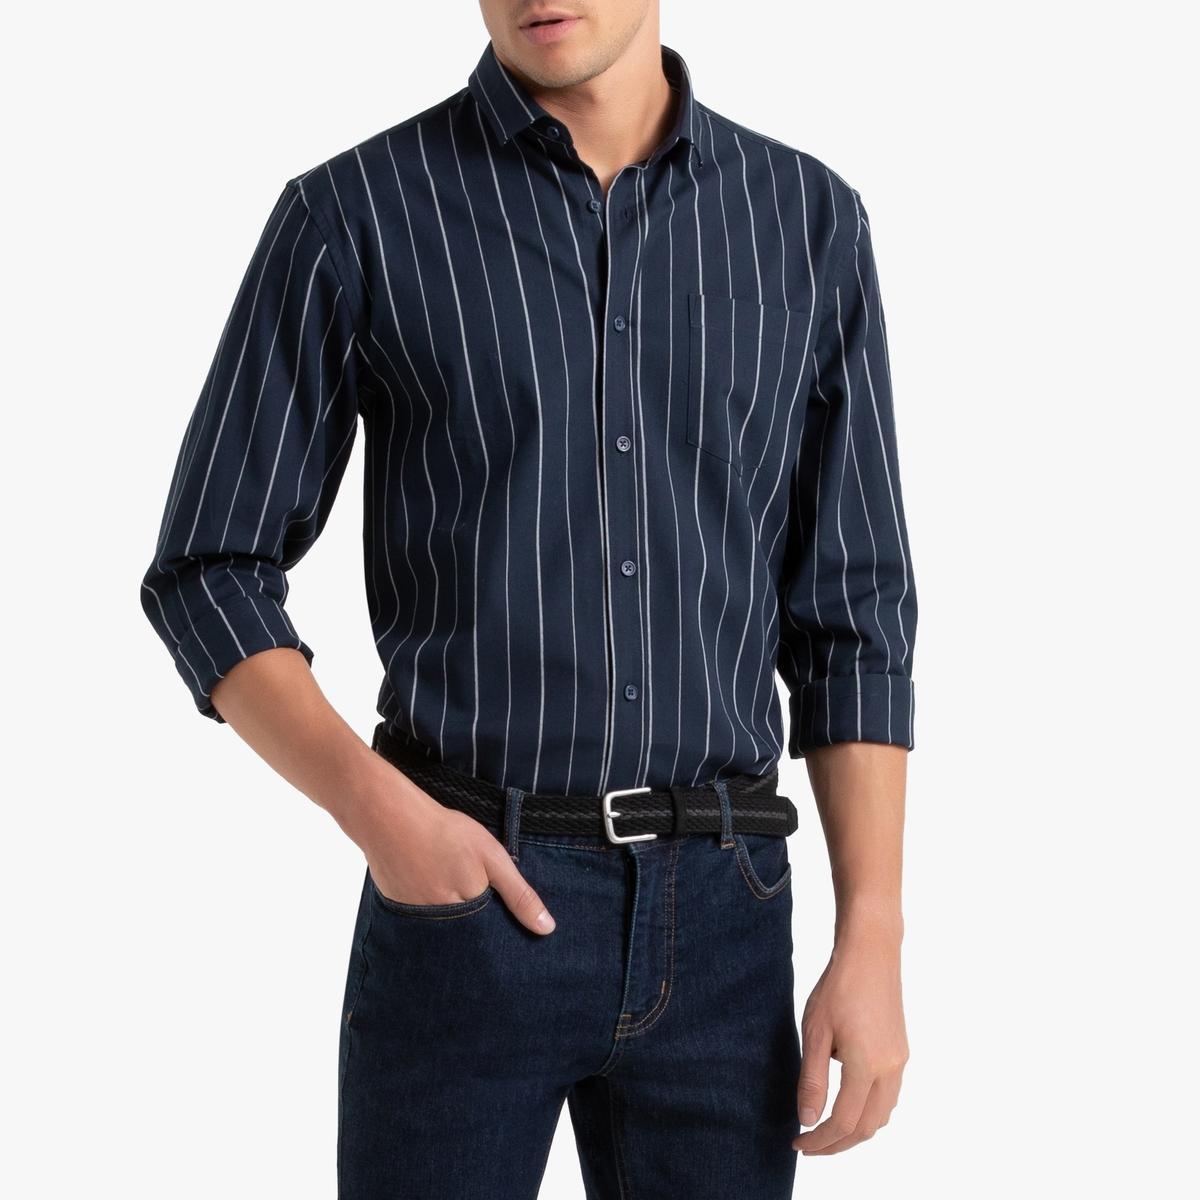 Camisa a rayas, corte recto de manga larga